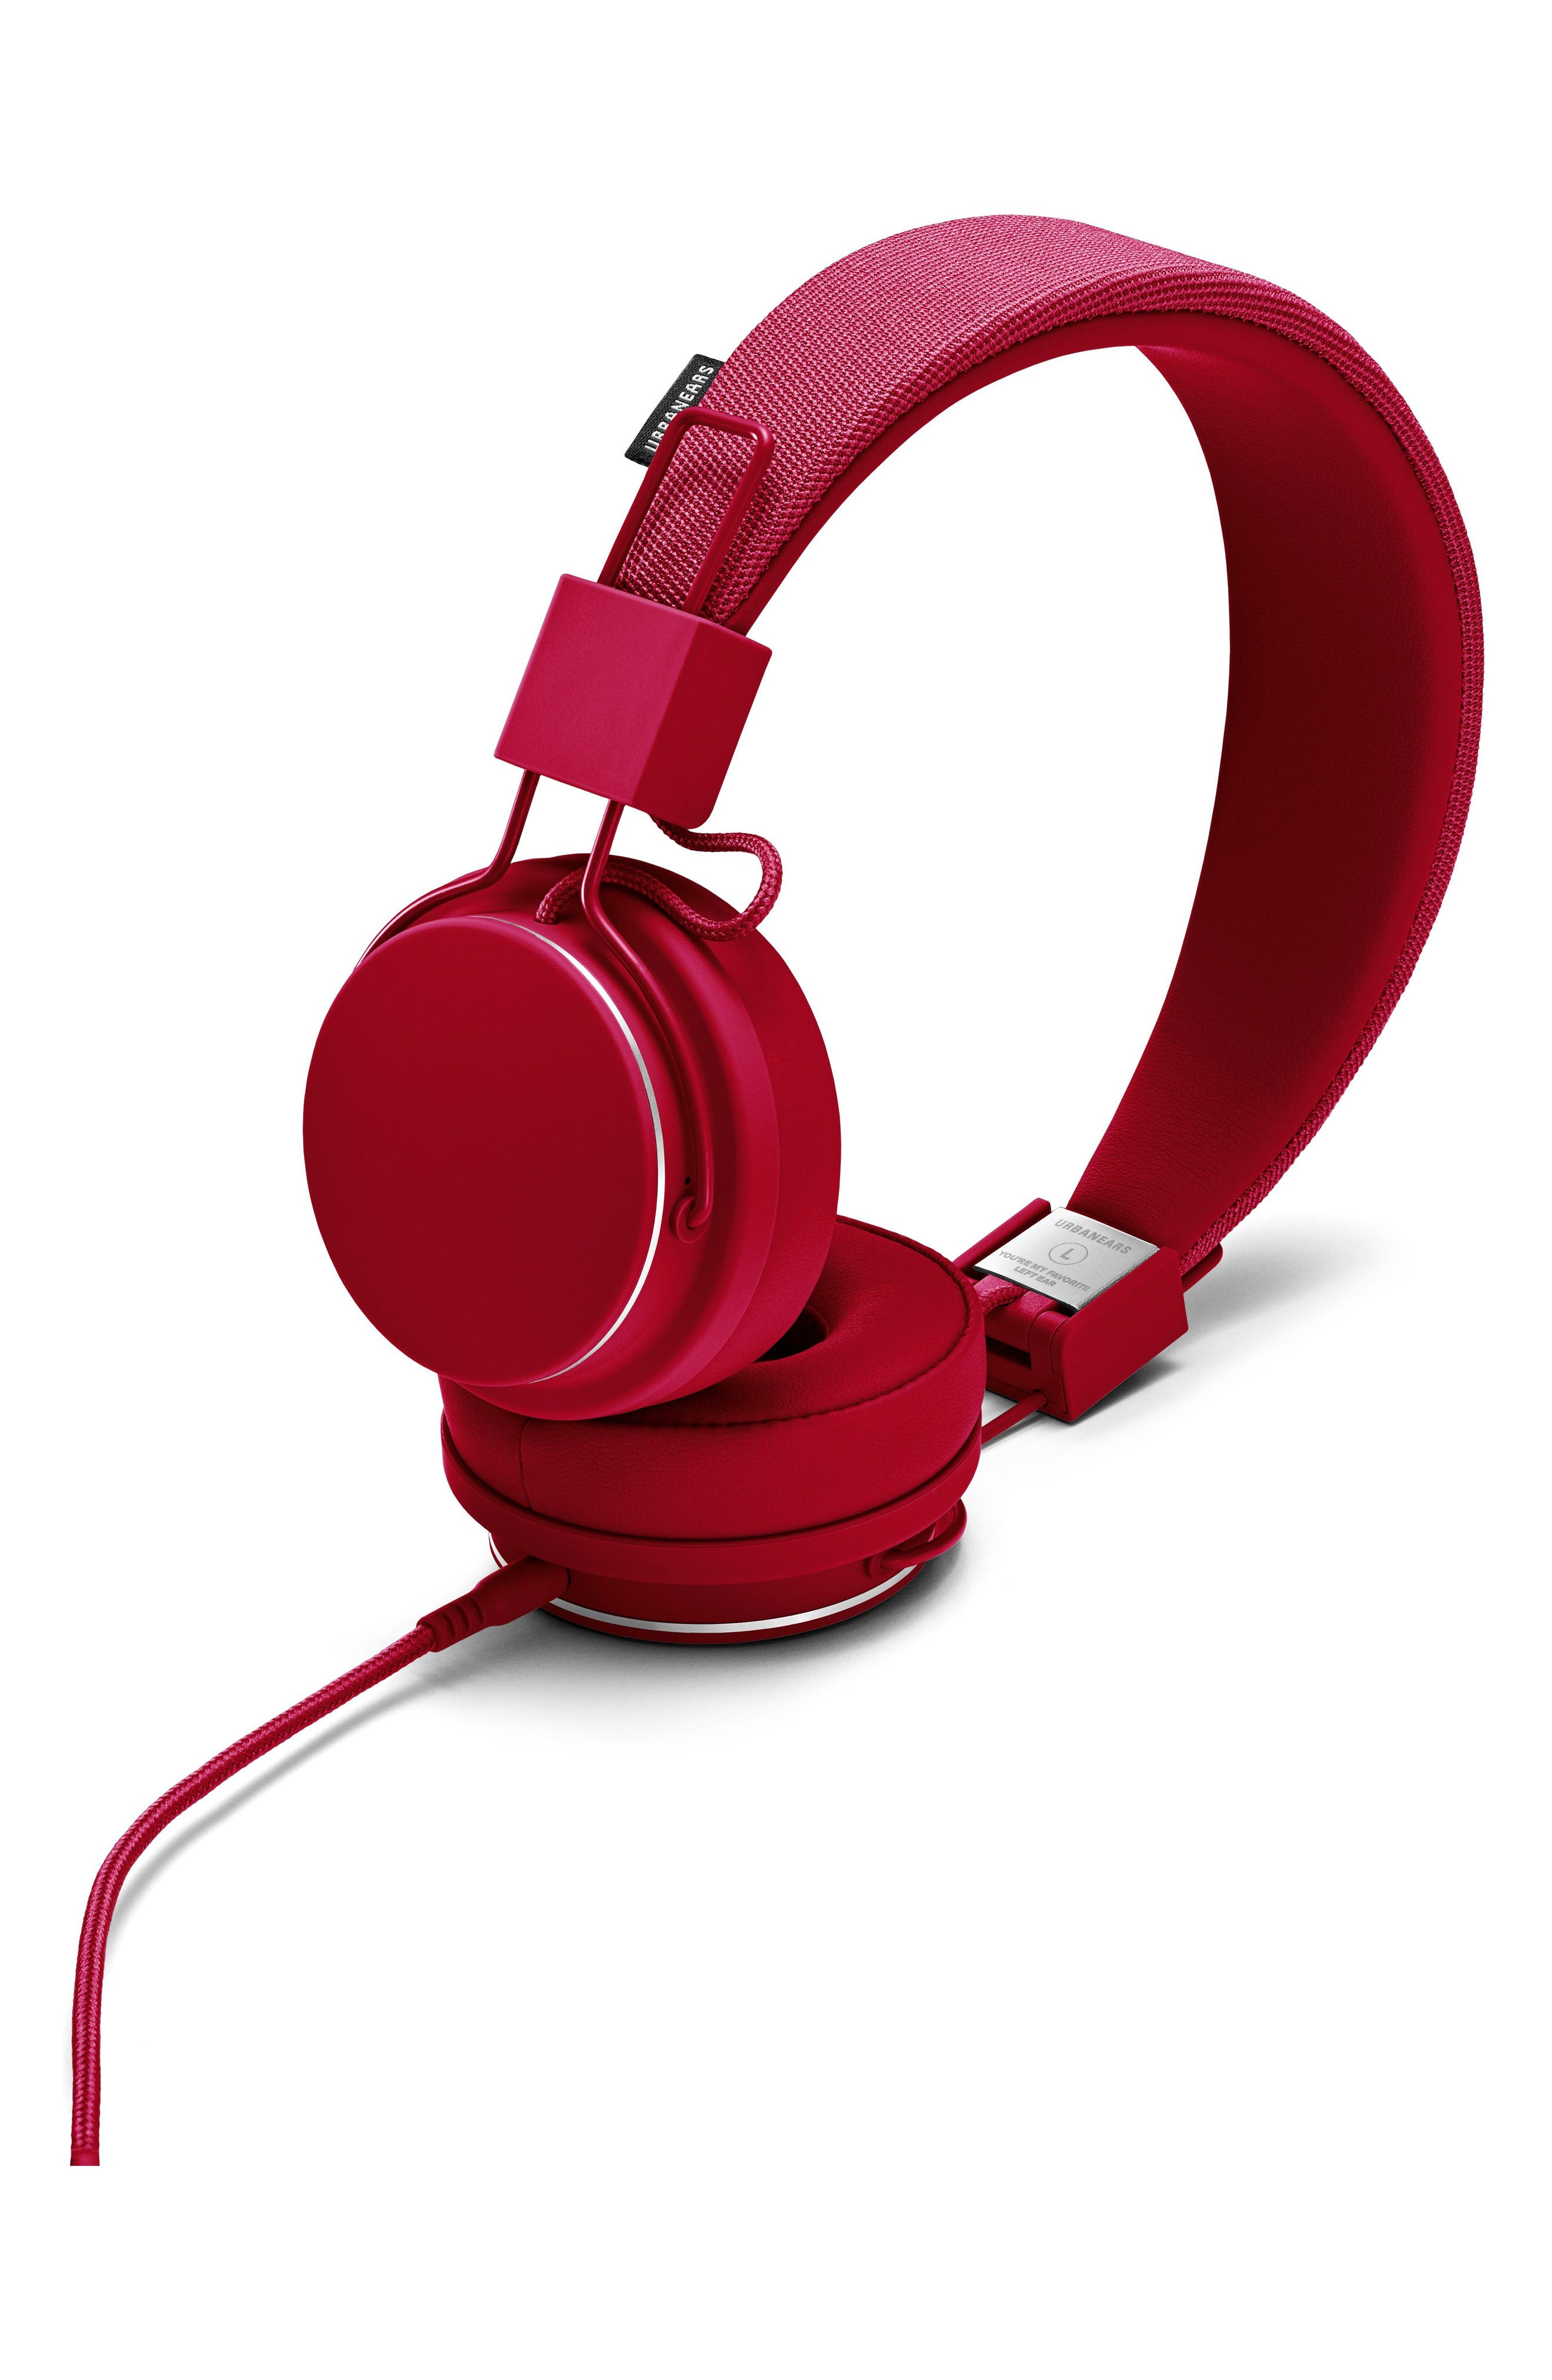 Main Image - Urbanears Plattan II On-Ear Headphones